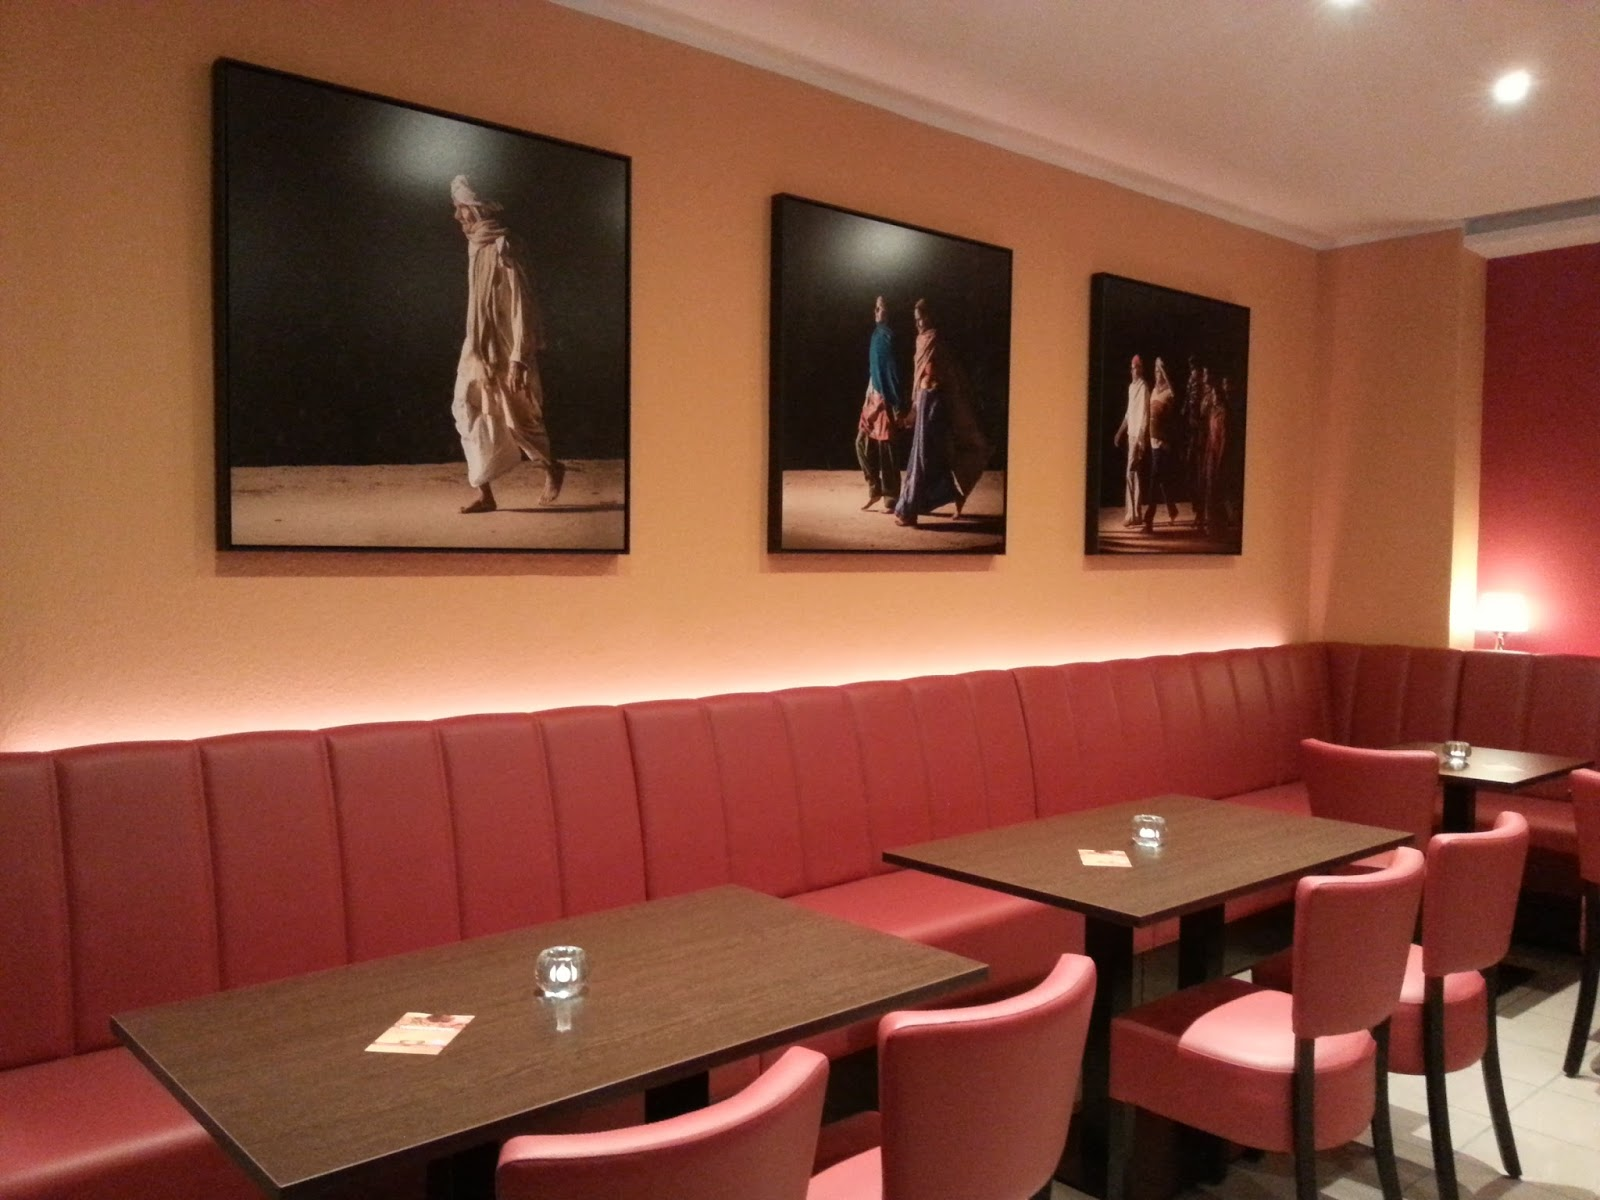 authentisch indisch lecker geheimtipp rajmahal restaurants dresden restaurant shop. Black Bedroom Furniture Sets. Home Design Ideas